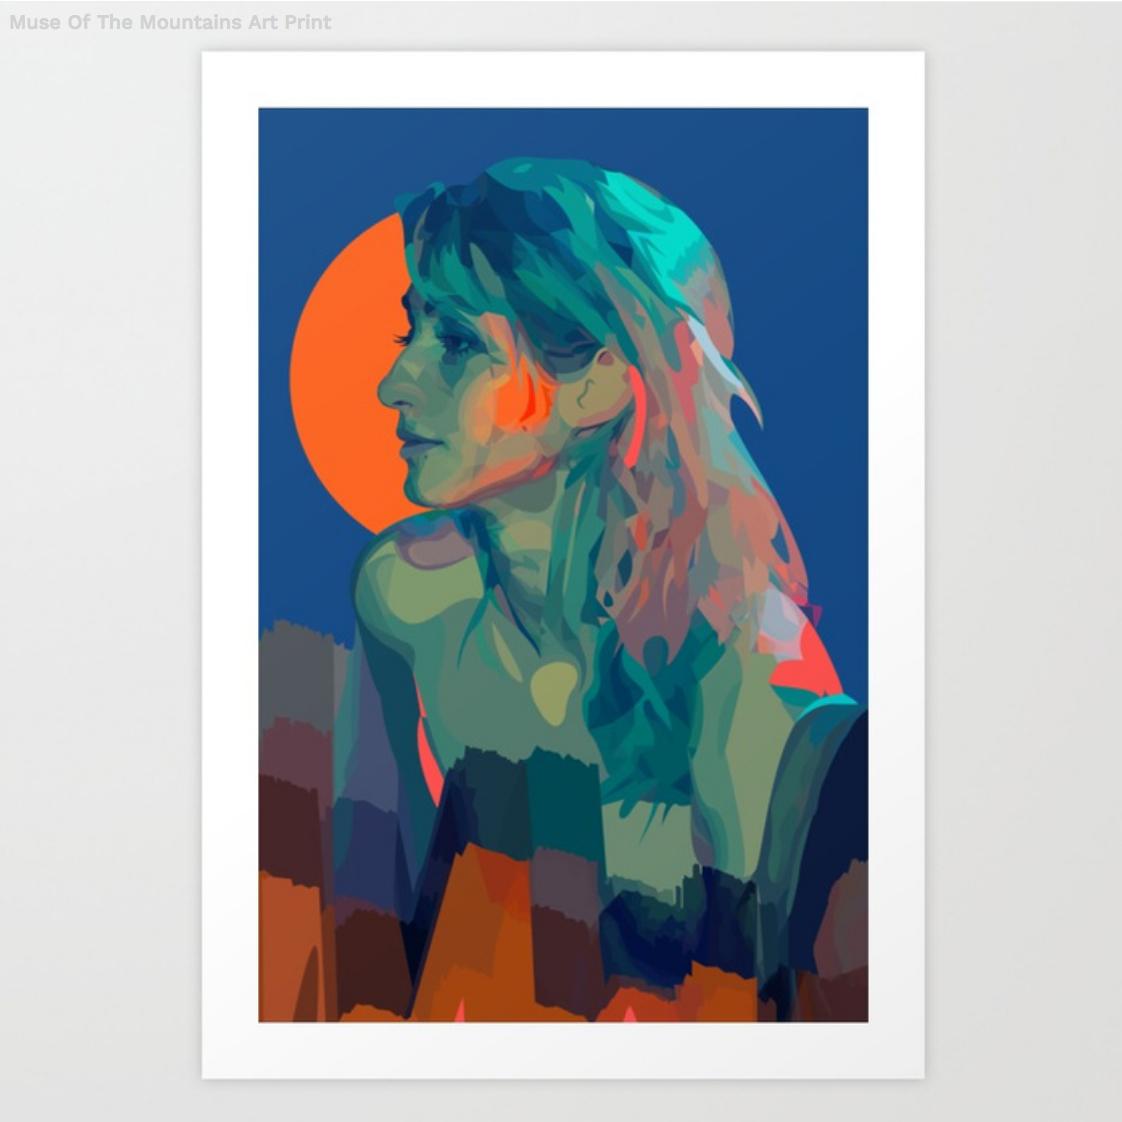 Designs by Geena Matuson (@geenamatuson) 'The Girl Mirage' #thegirlmirage on Society6.com/geenamatuson.